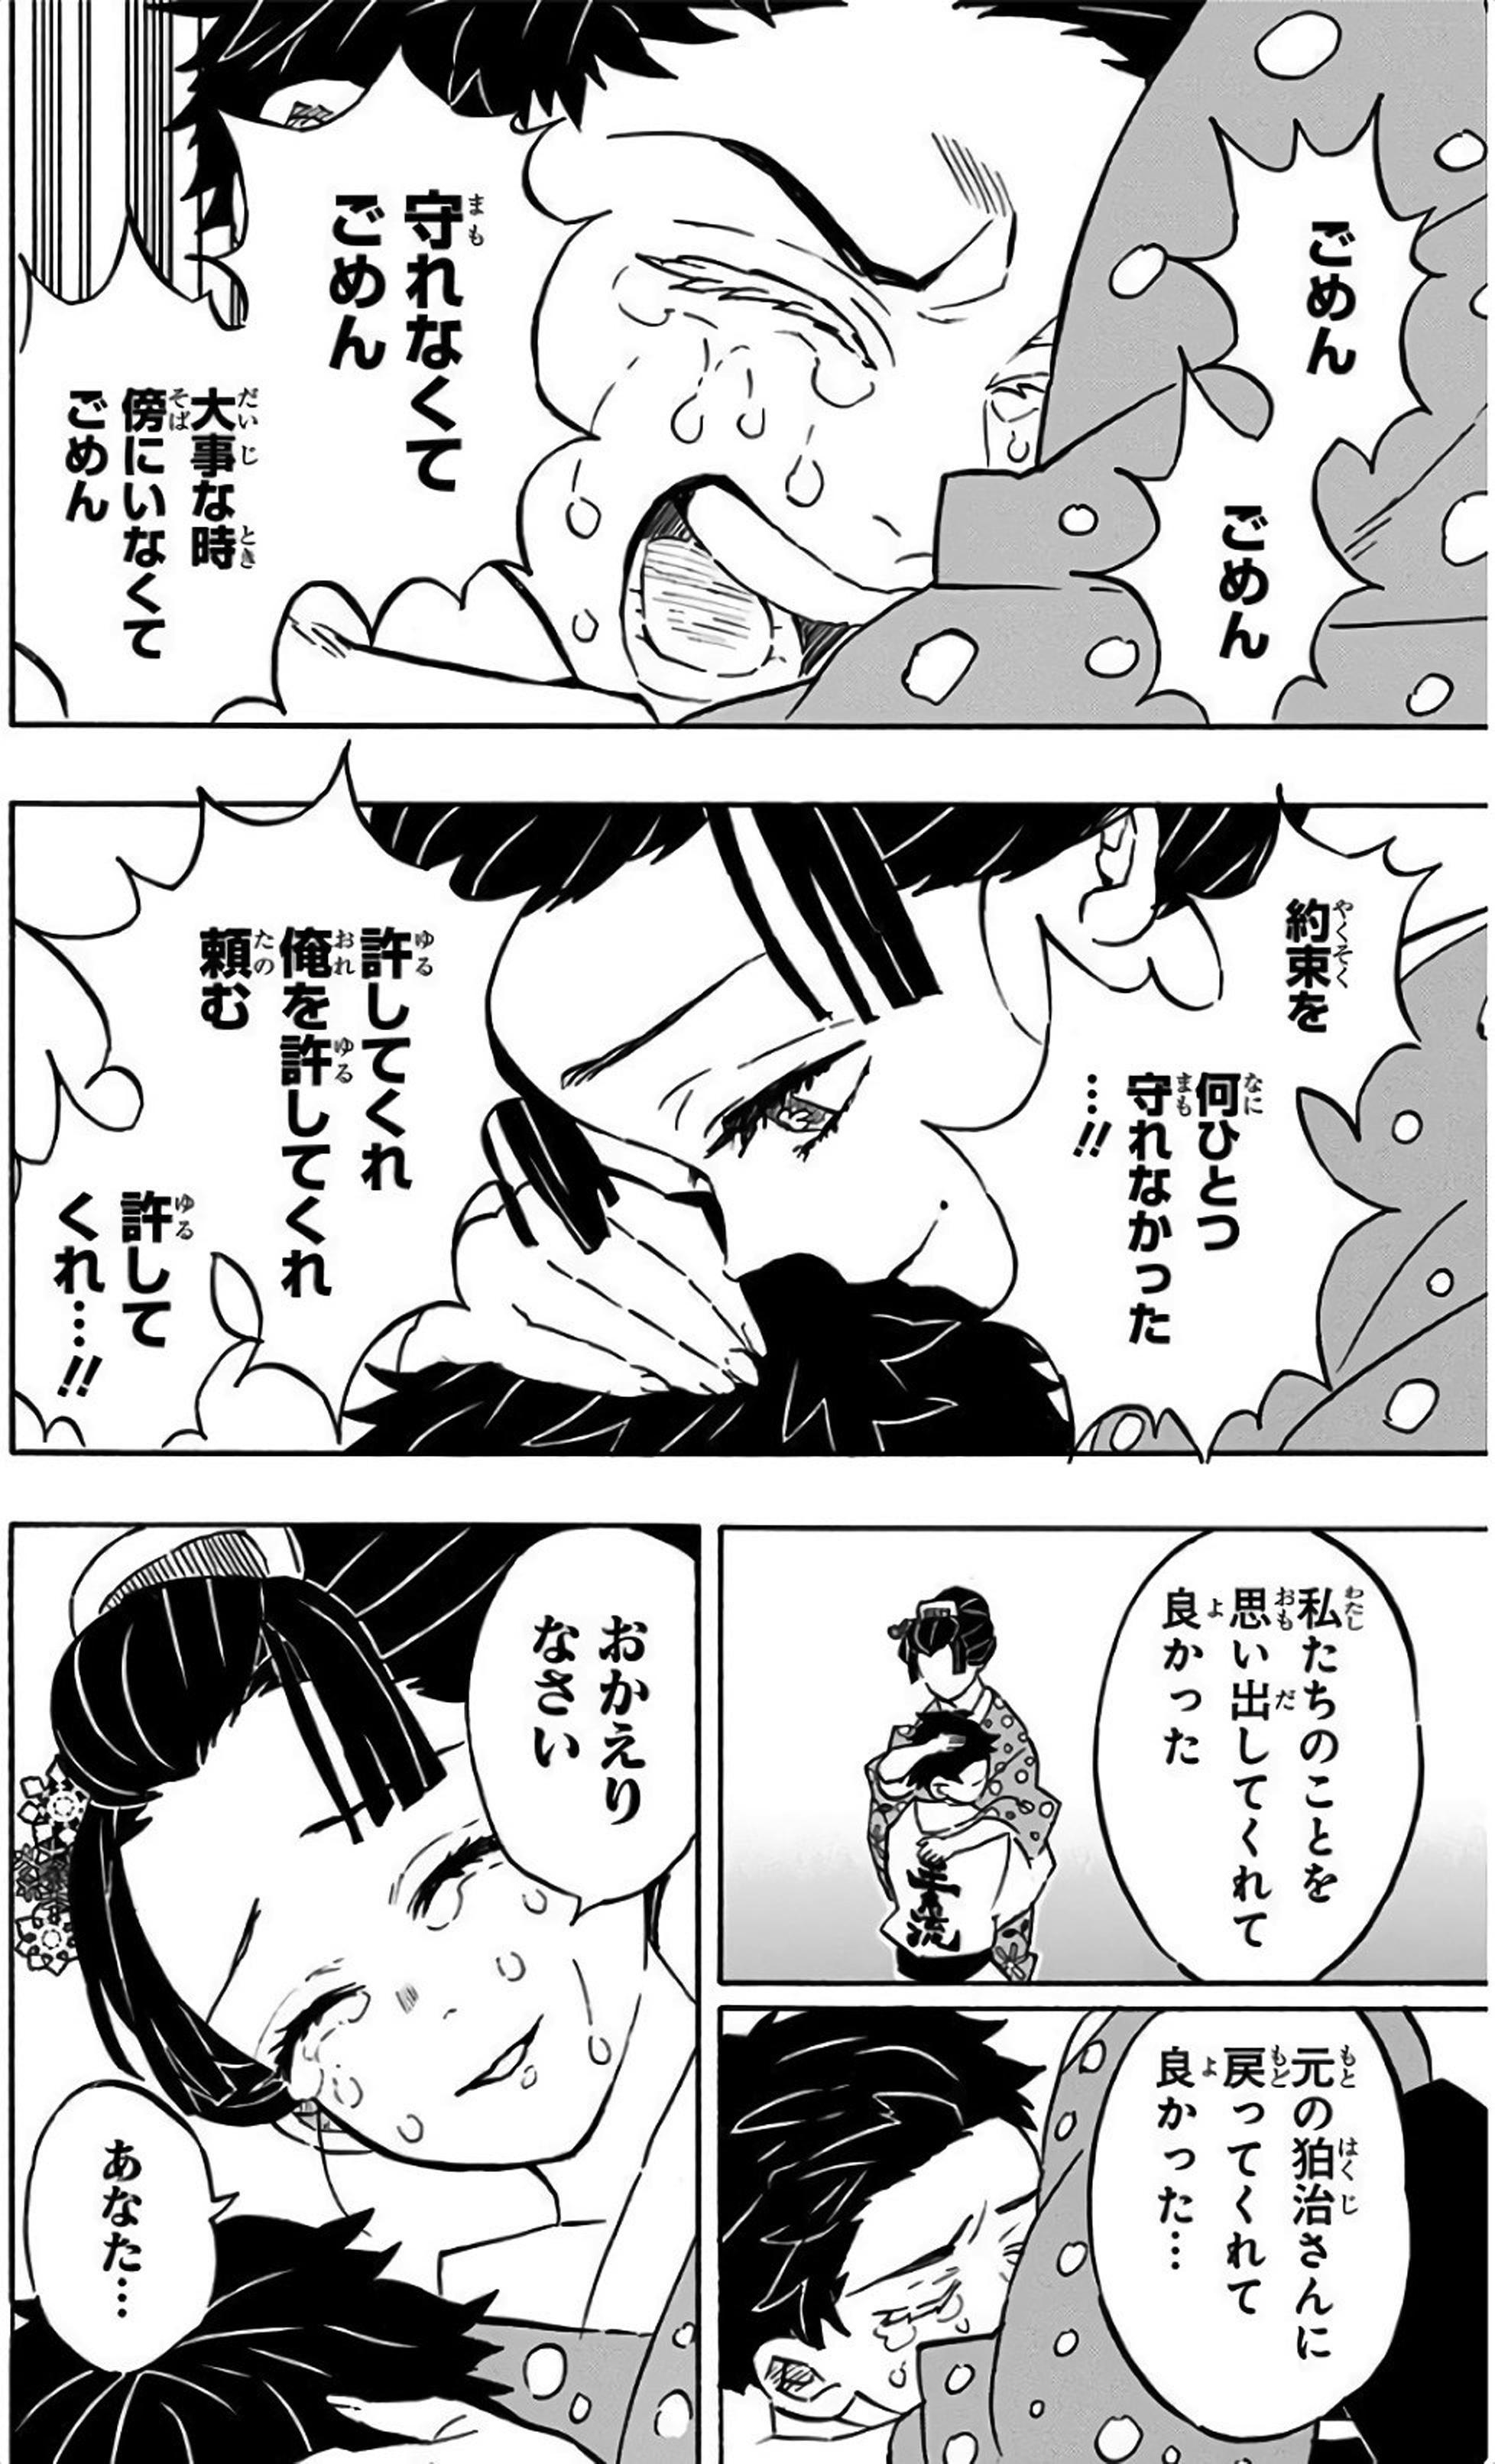 巻 鬼 刃 18 の 滅 漫画